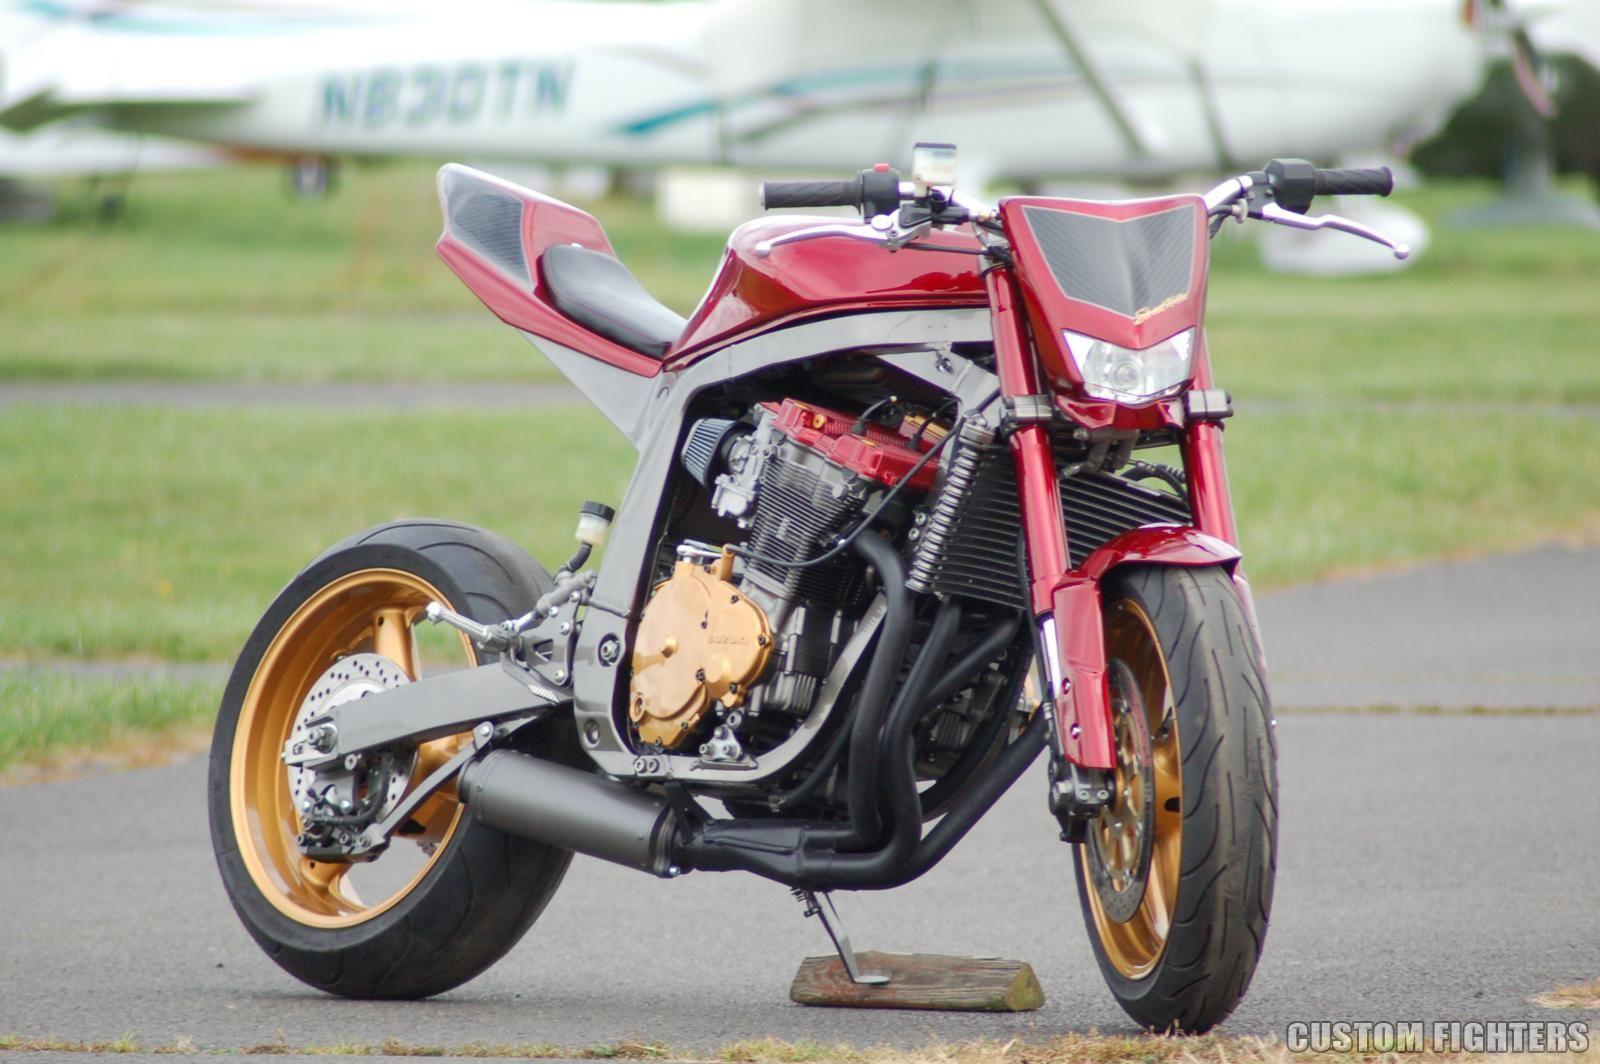 1992 Gsxr 750 | Streetfighter | Motorcycle, Gsxr 750, Bike